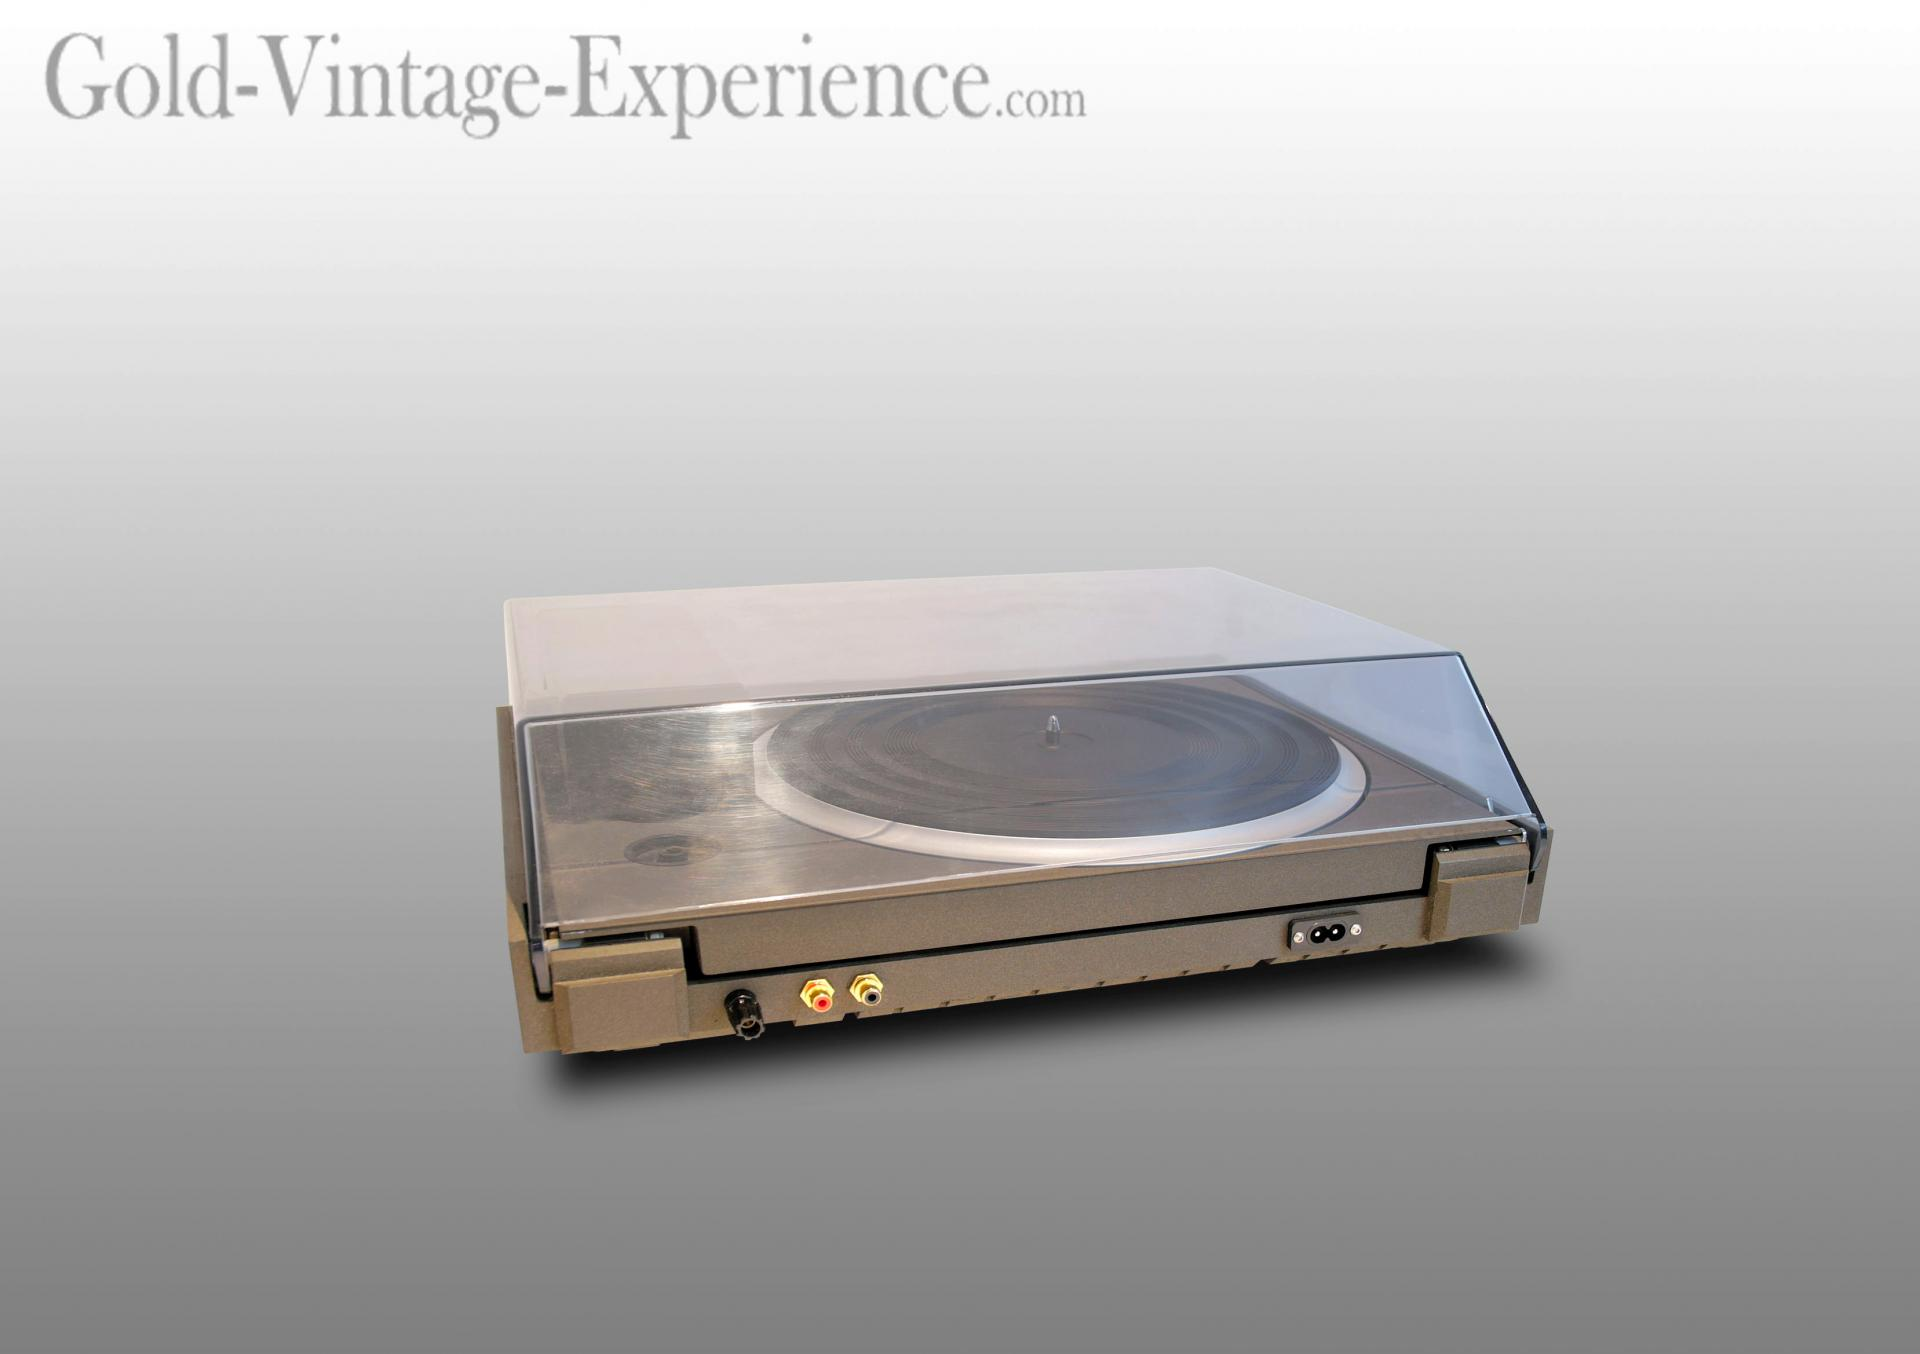 Platine vinyle vintage revox b795 bras tangentiel - Platines vinyles vintage ...